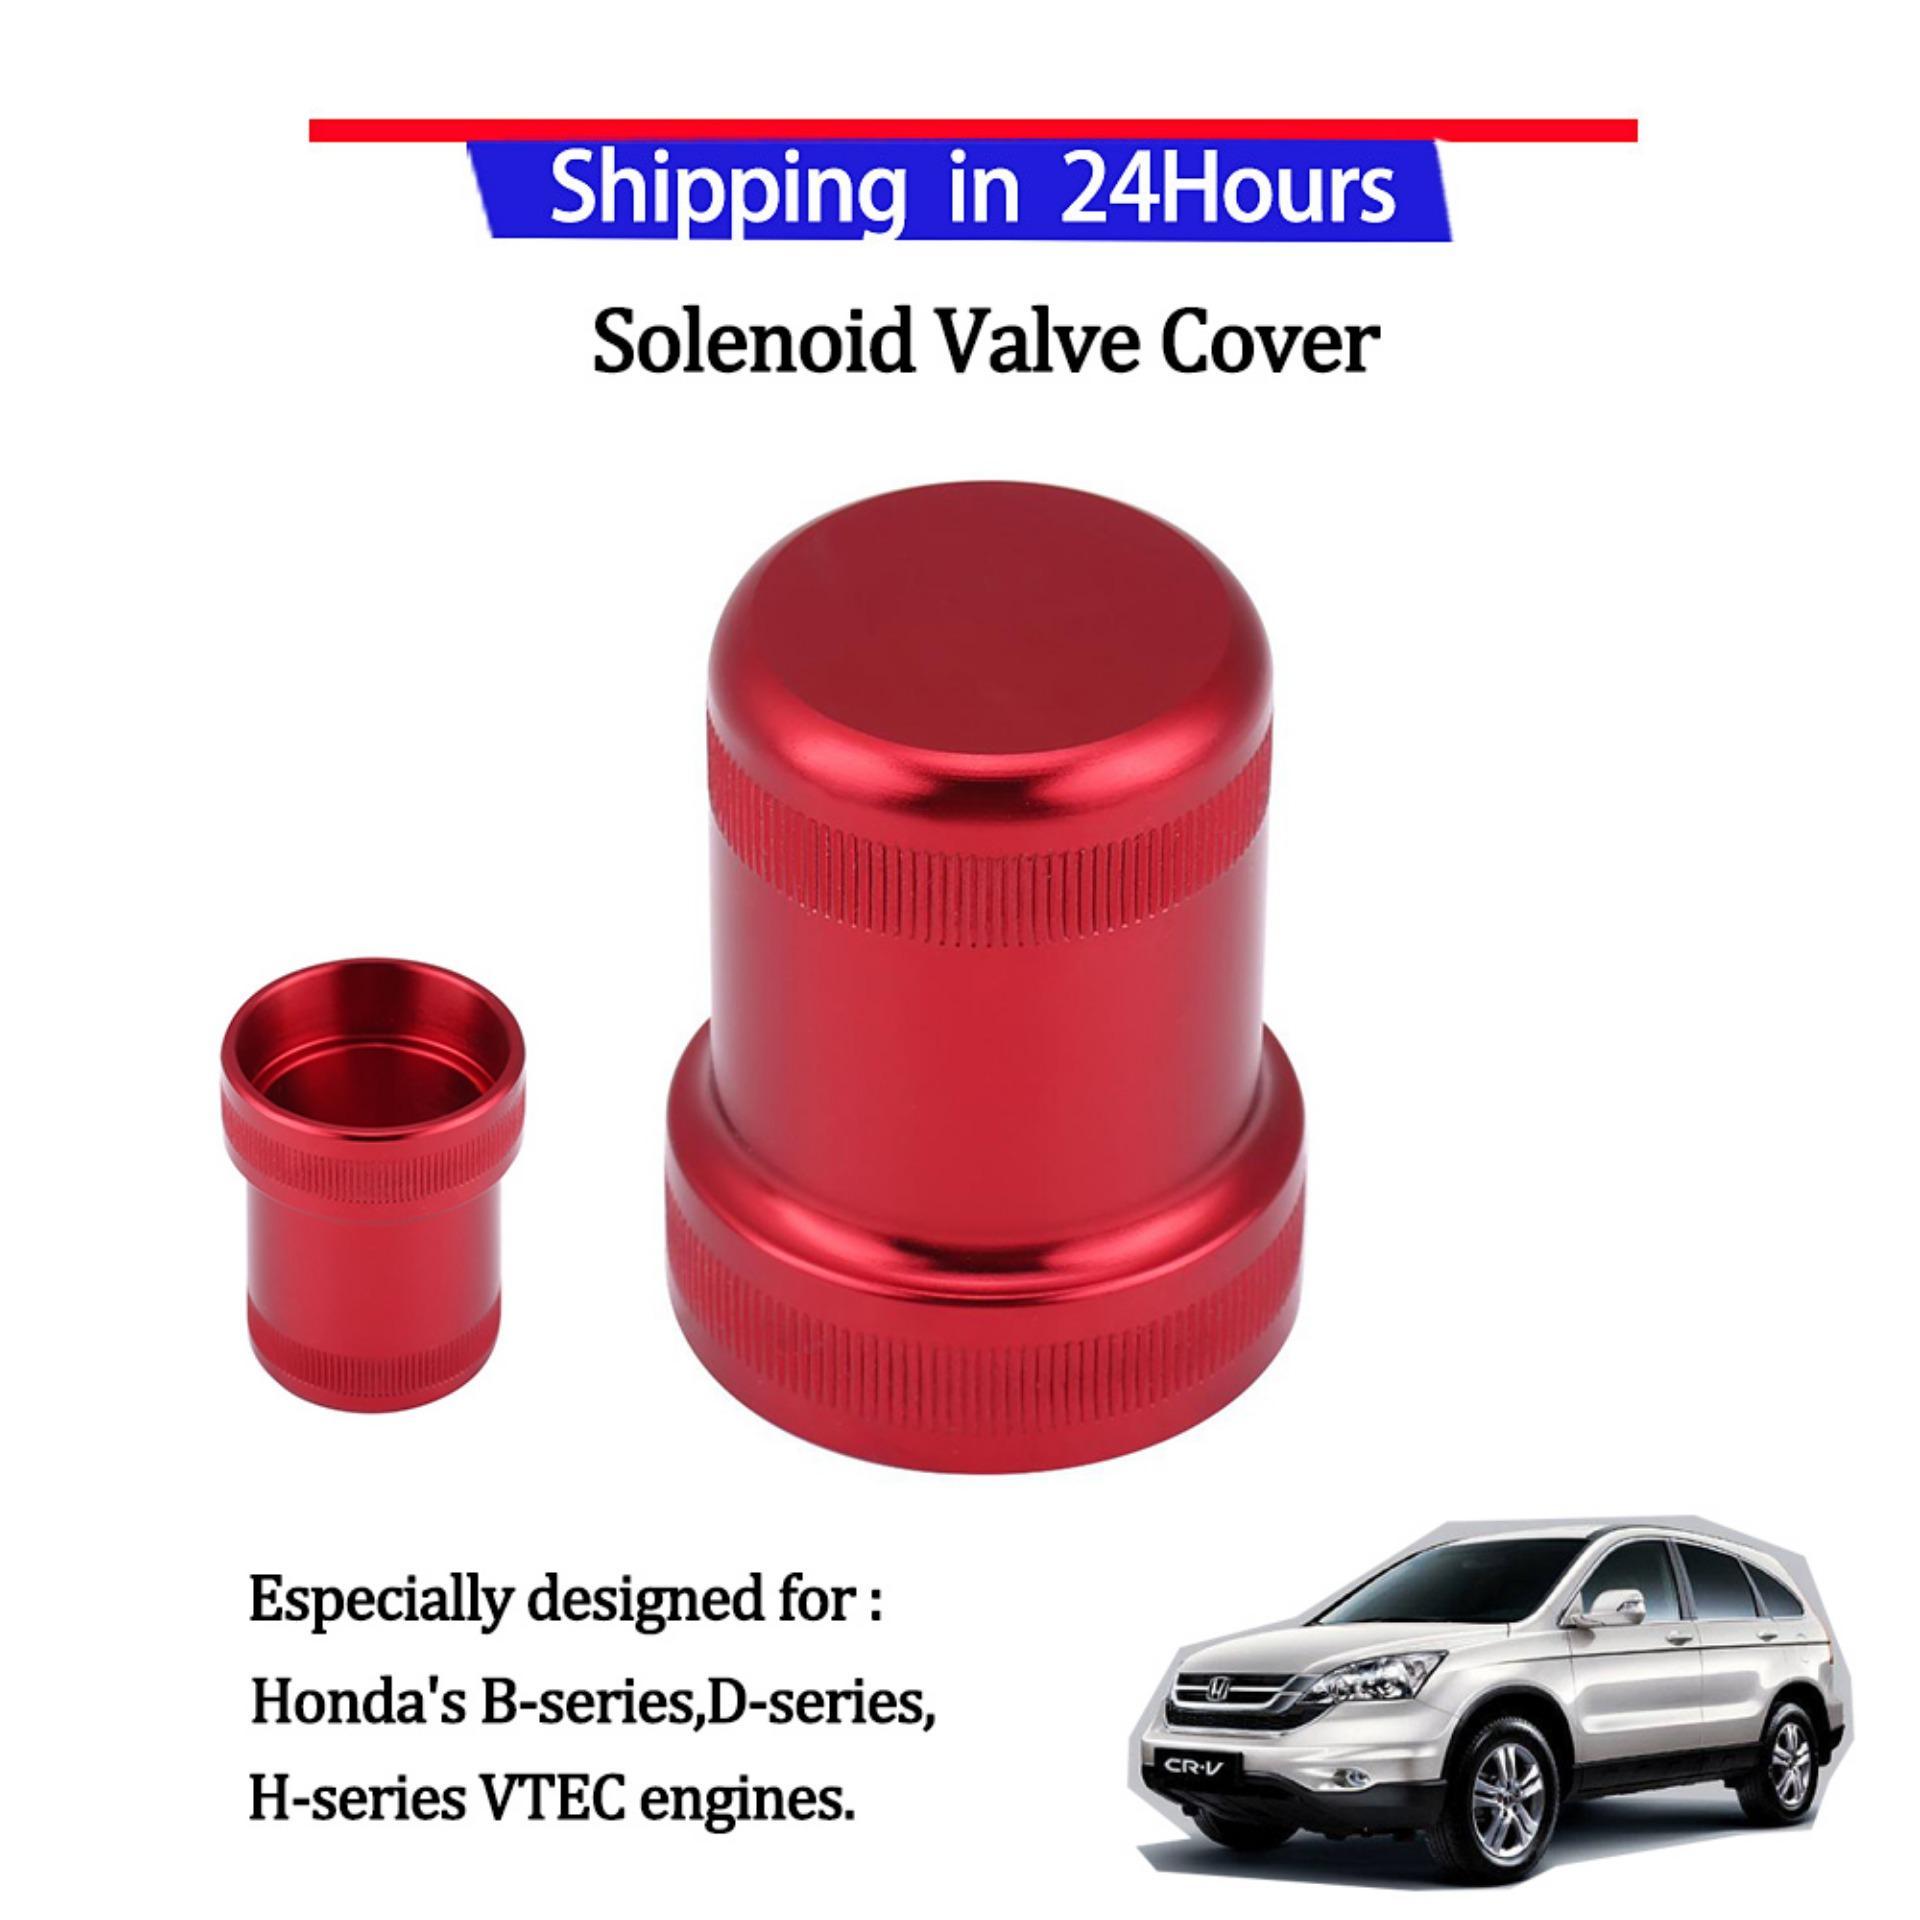 New Aluminum Solenoid Cover For Honda/'s B-series D-series H-series VTEC BLUE